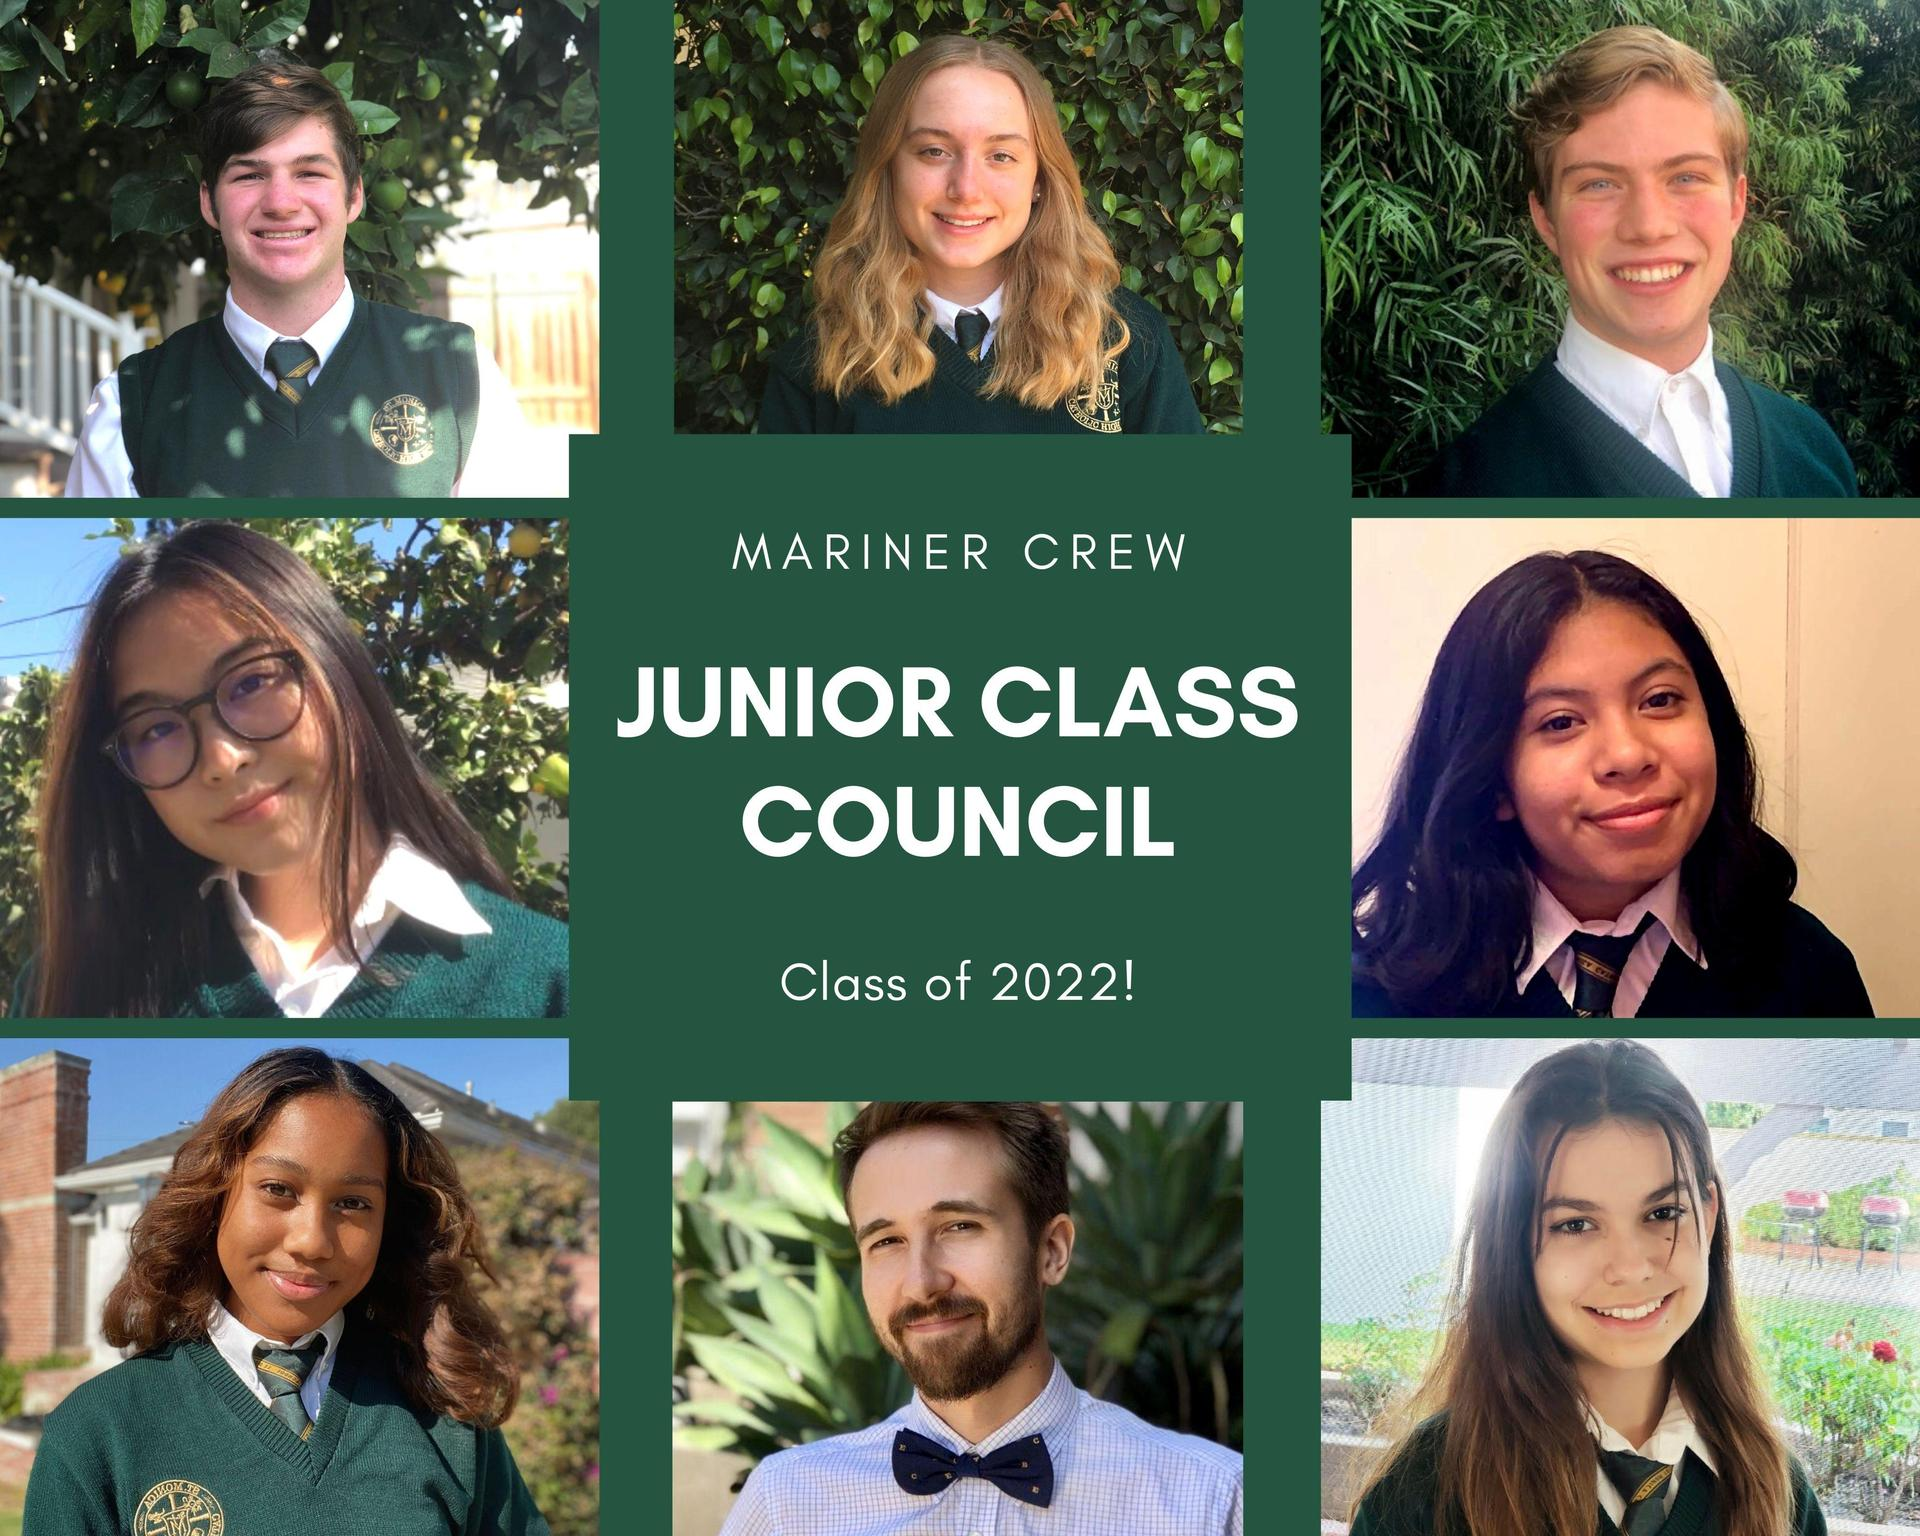 Junior Class ('22) Council